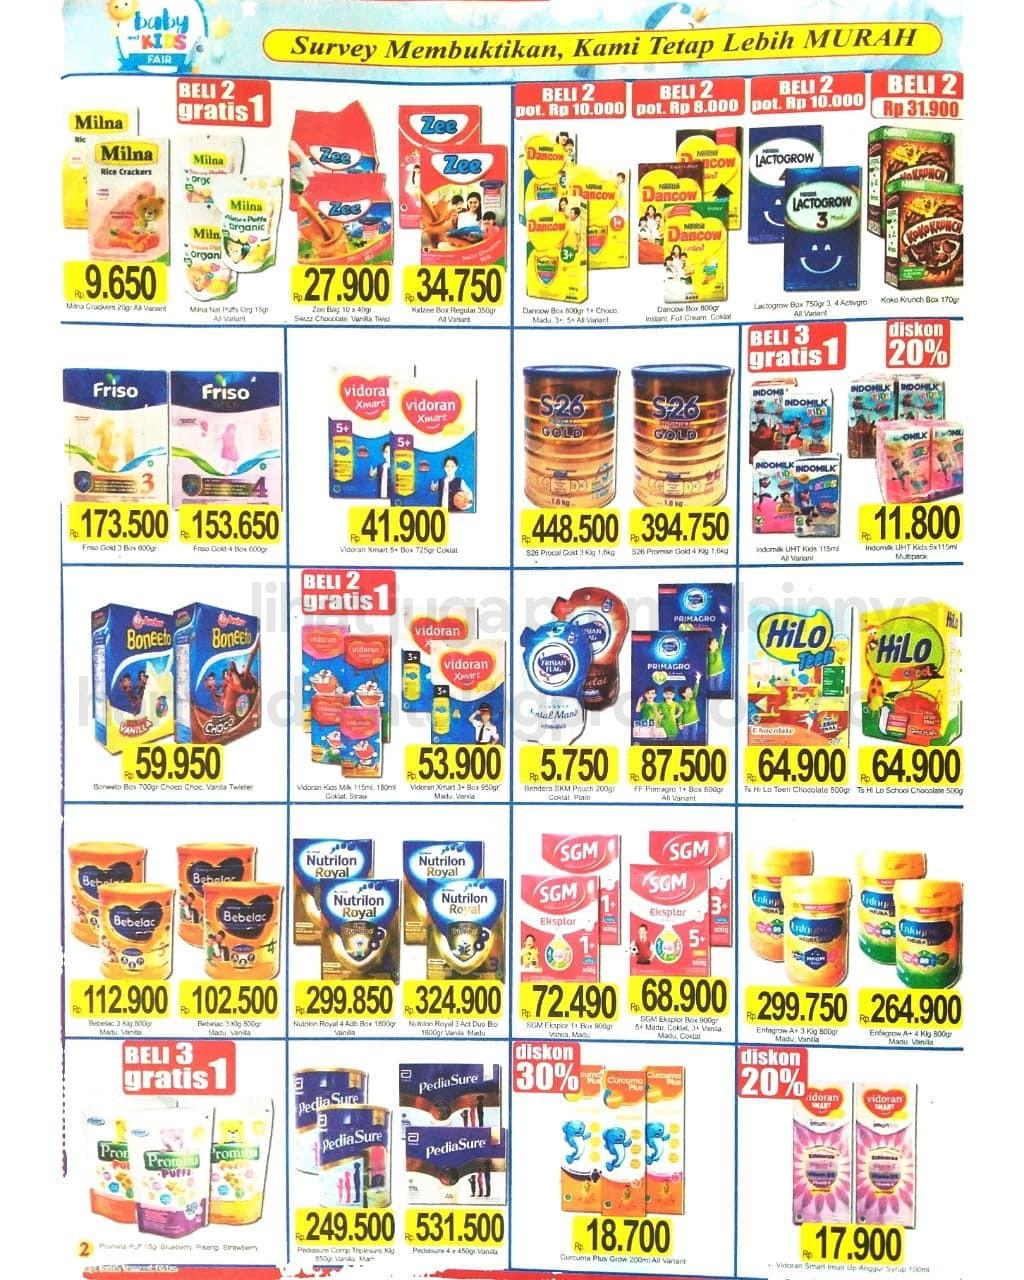 Katalog Promo NAGA SWALAYAN Terbaru Periode 25 September - 10 Oktober 2021